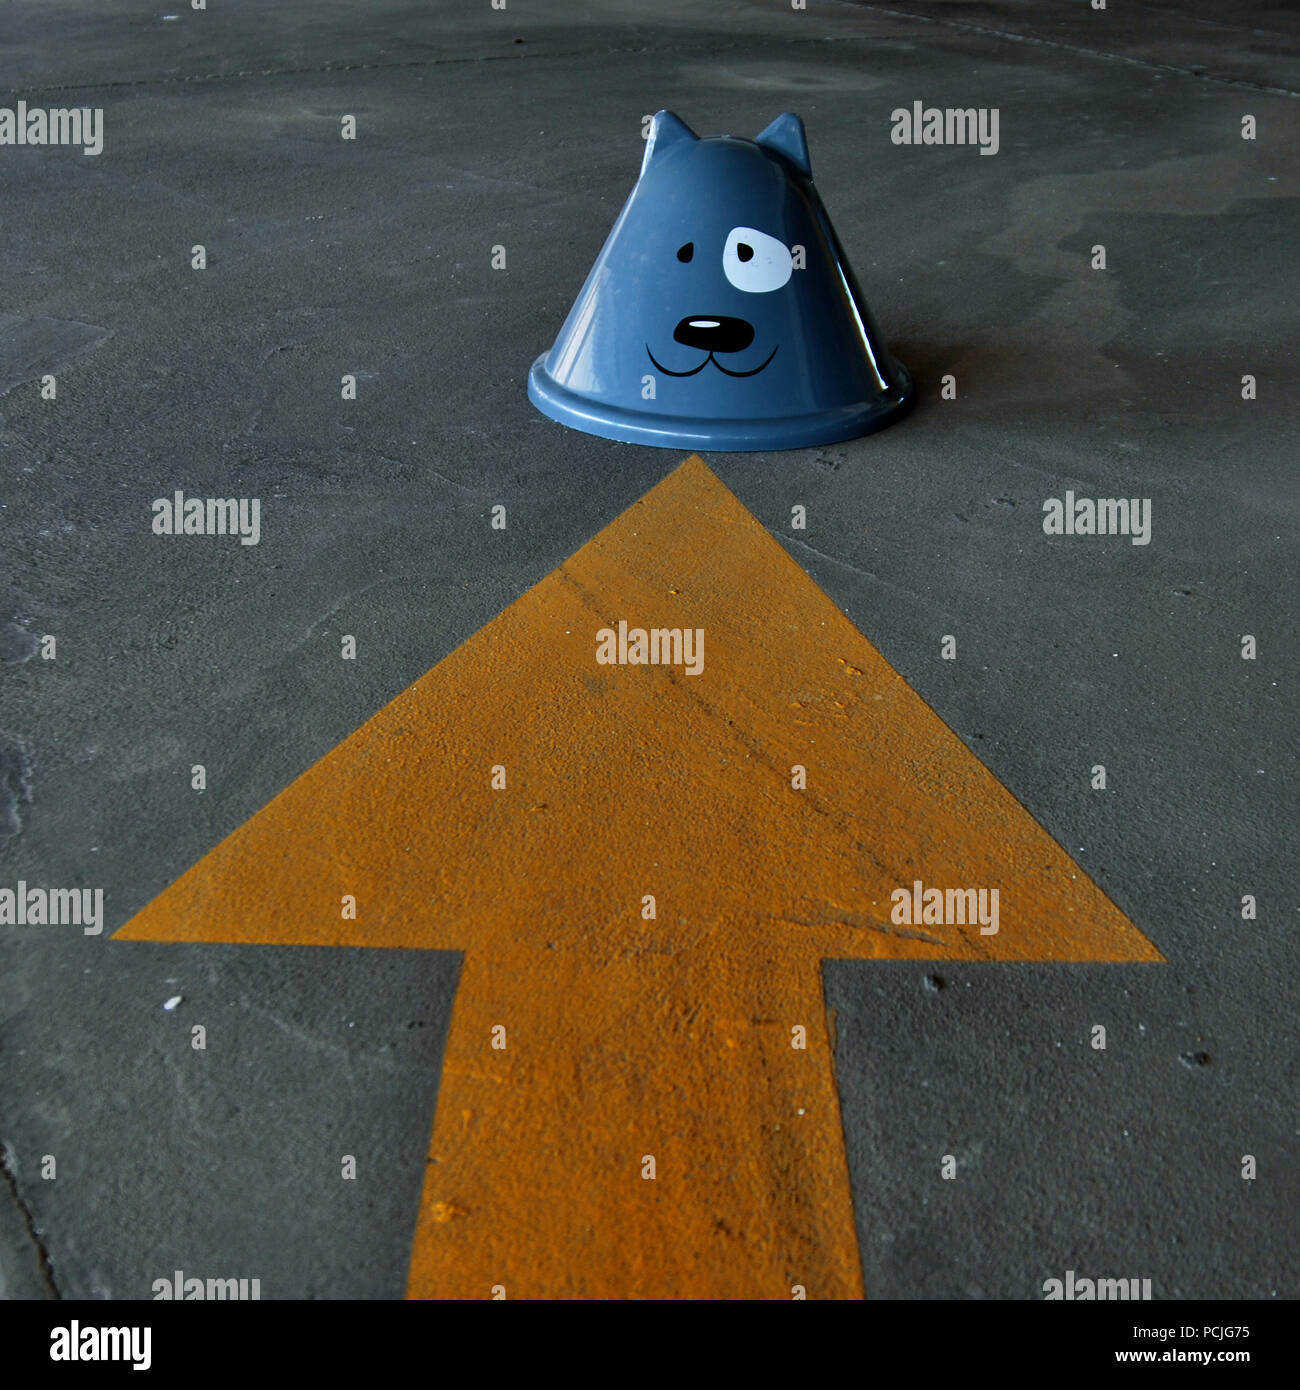 humor,bizarre,arrow,animal figure - Stock Image